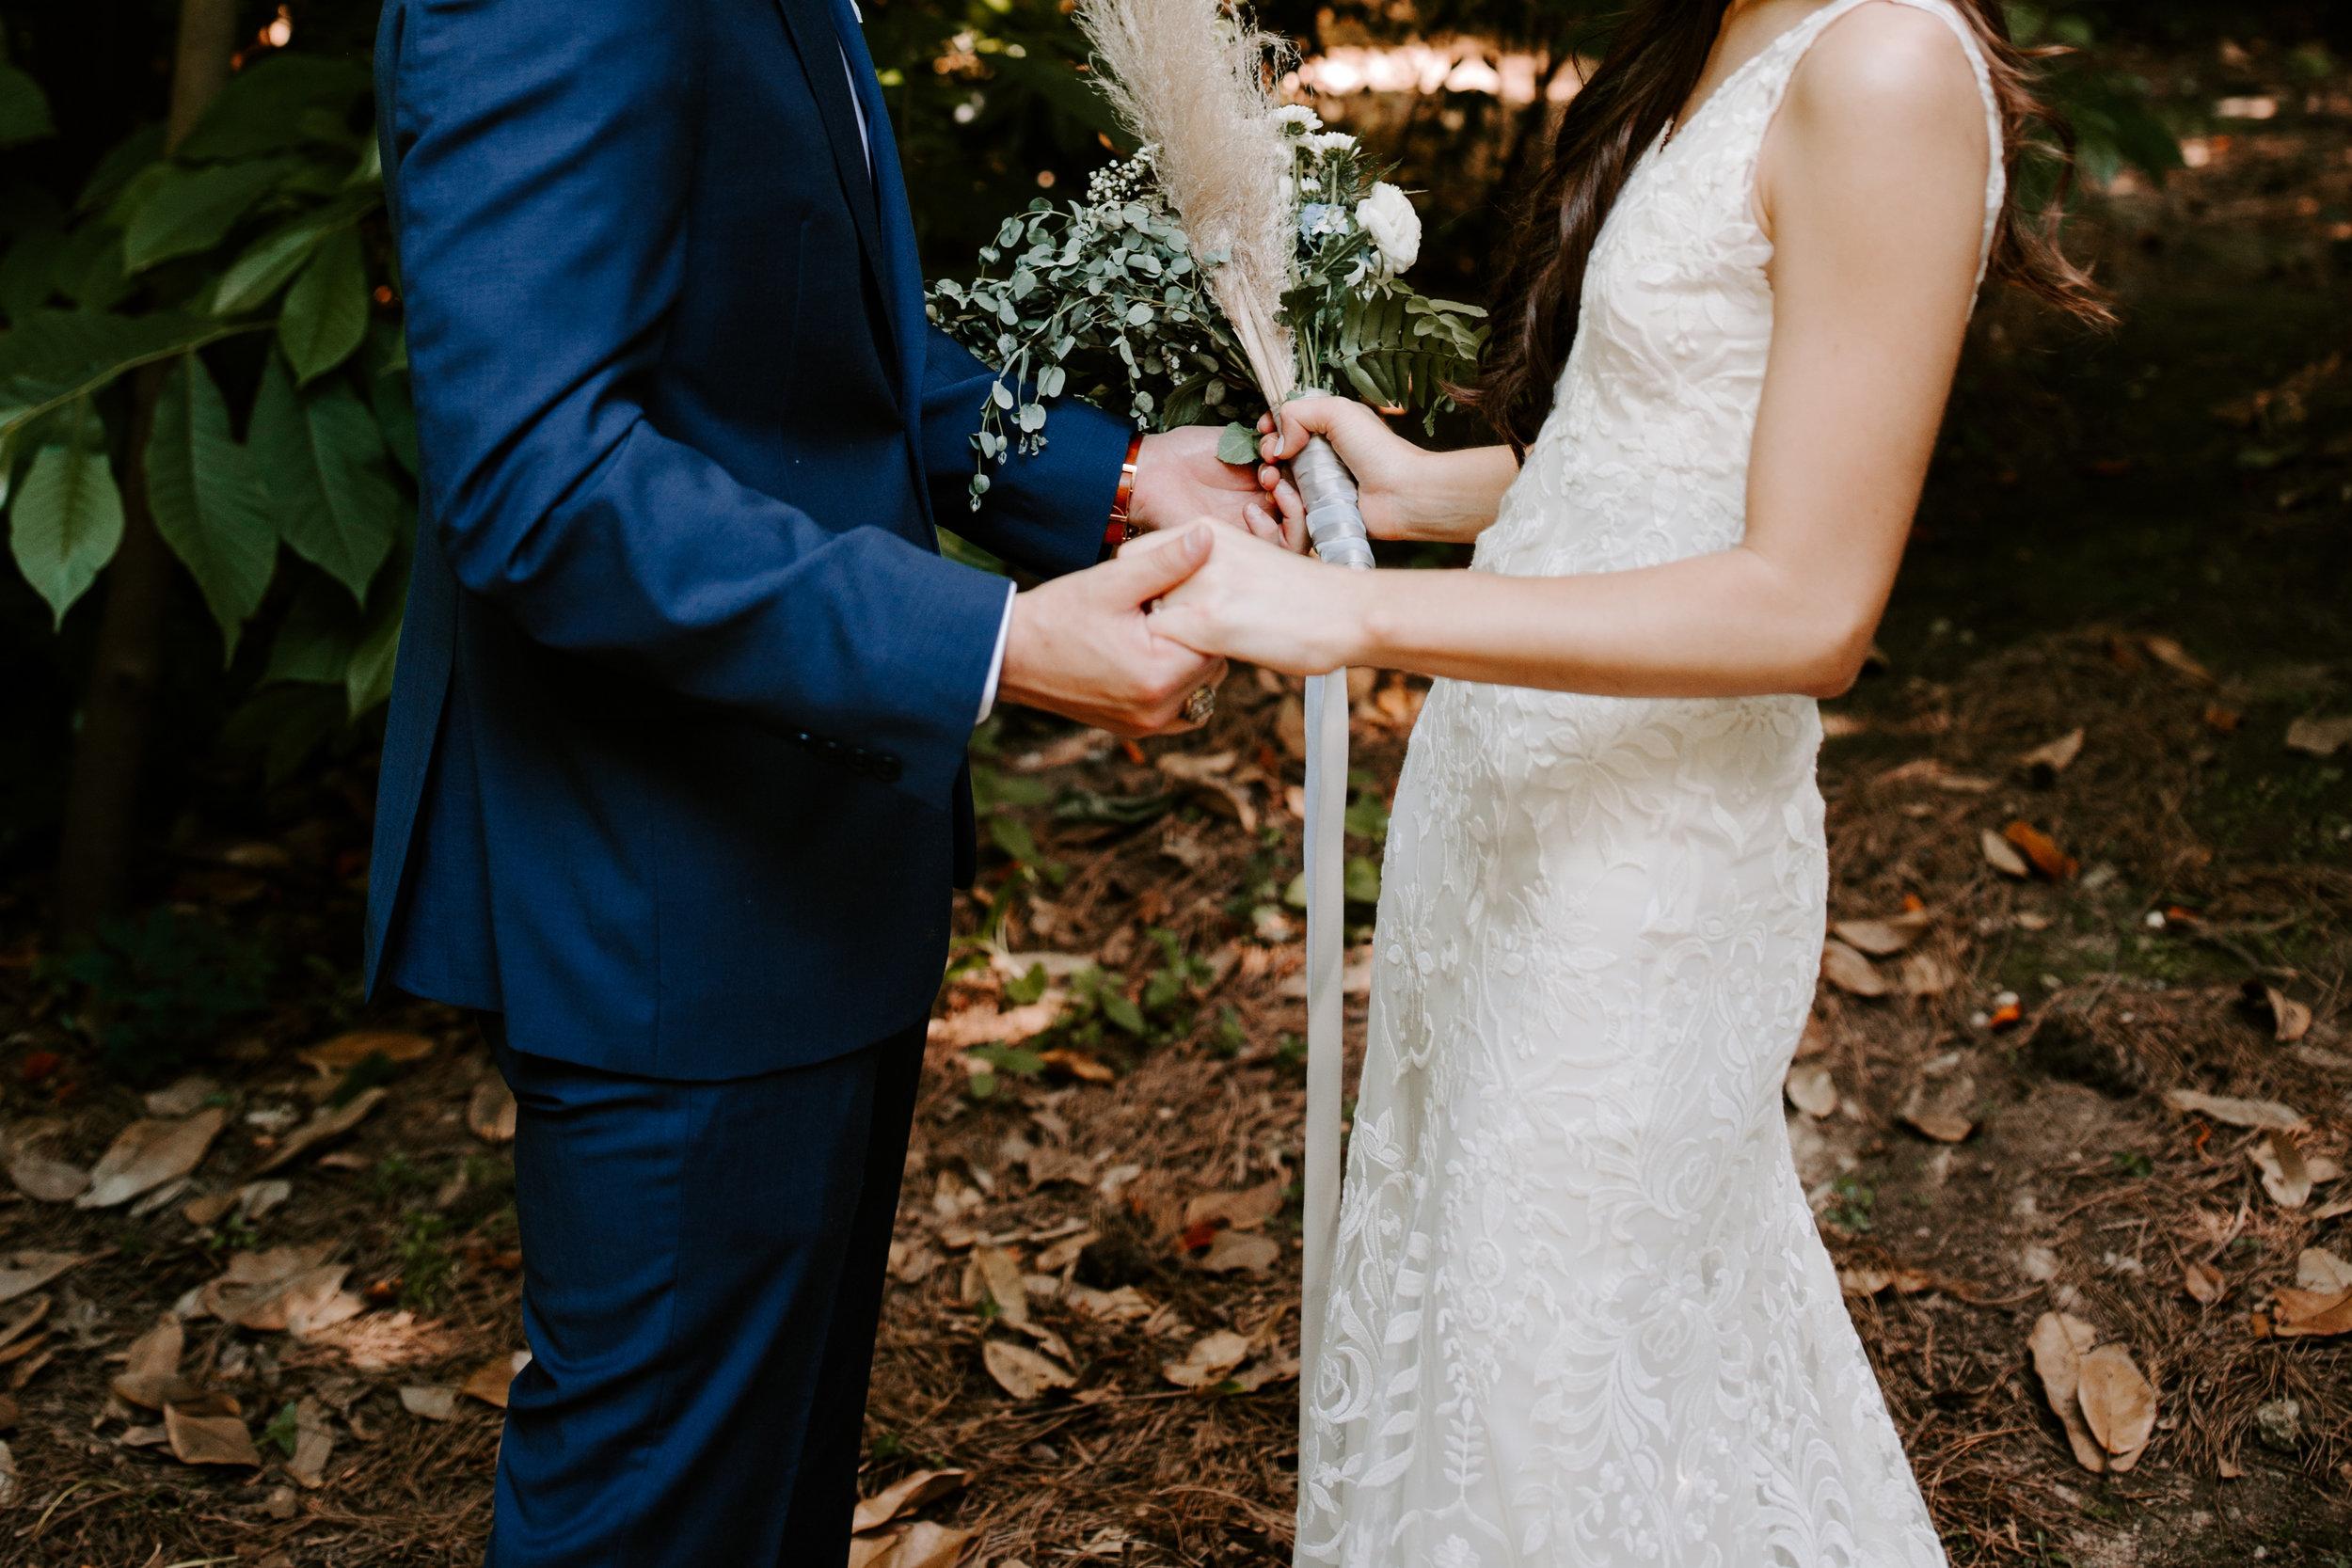 daywedding-183.jpg